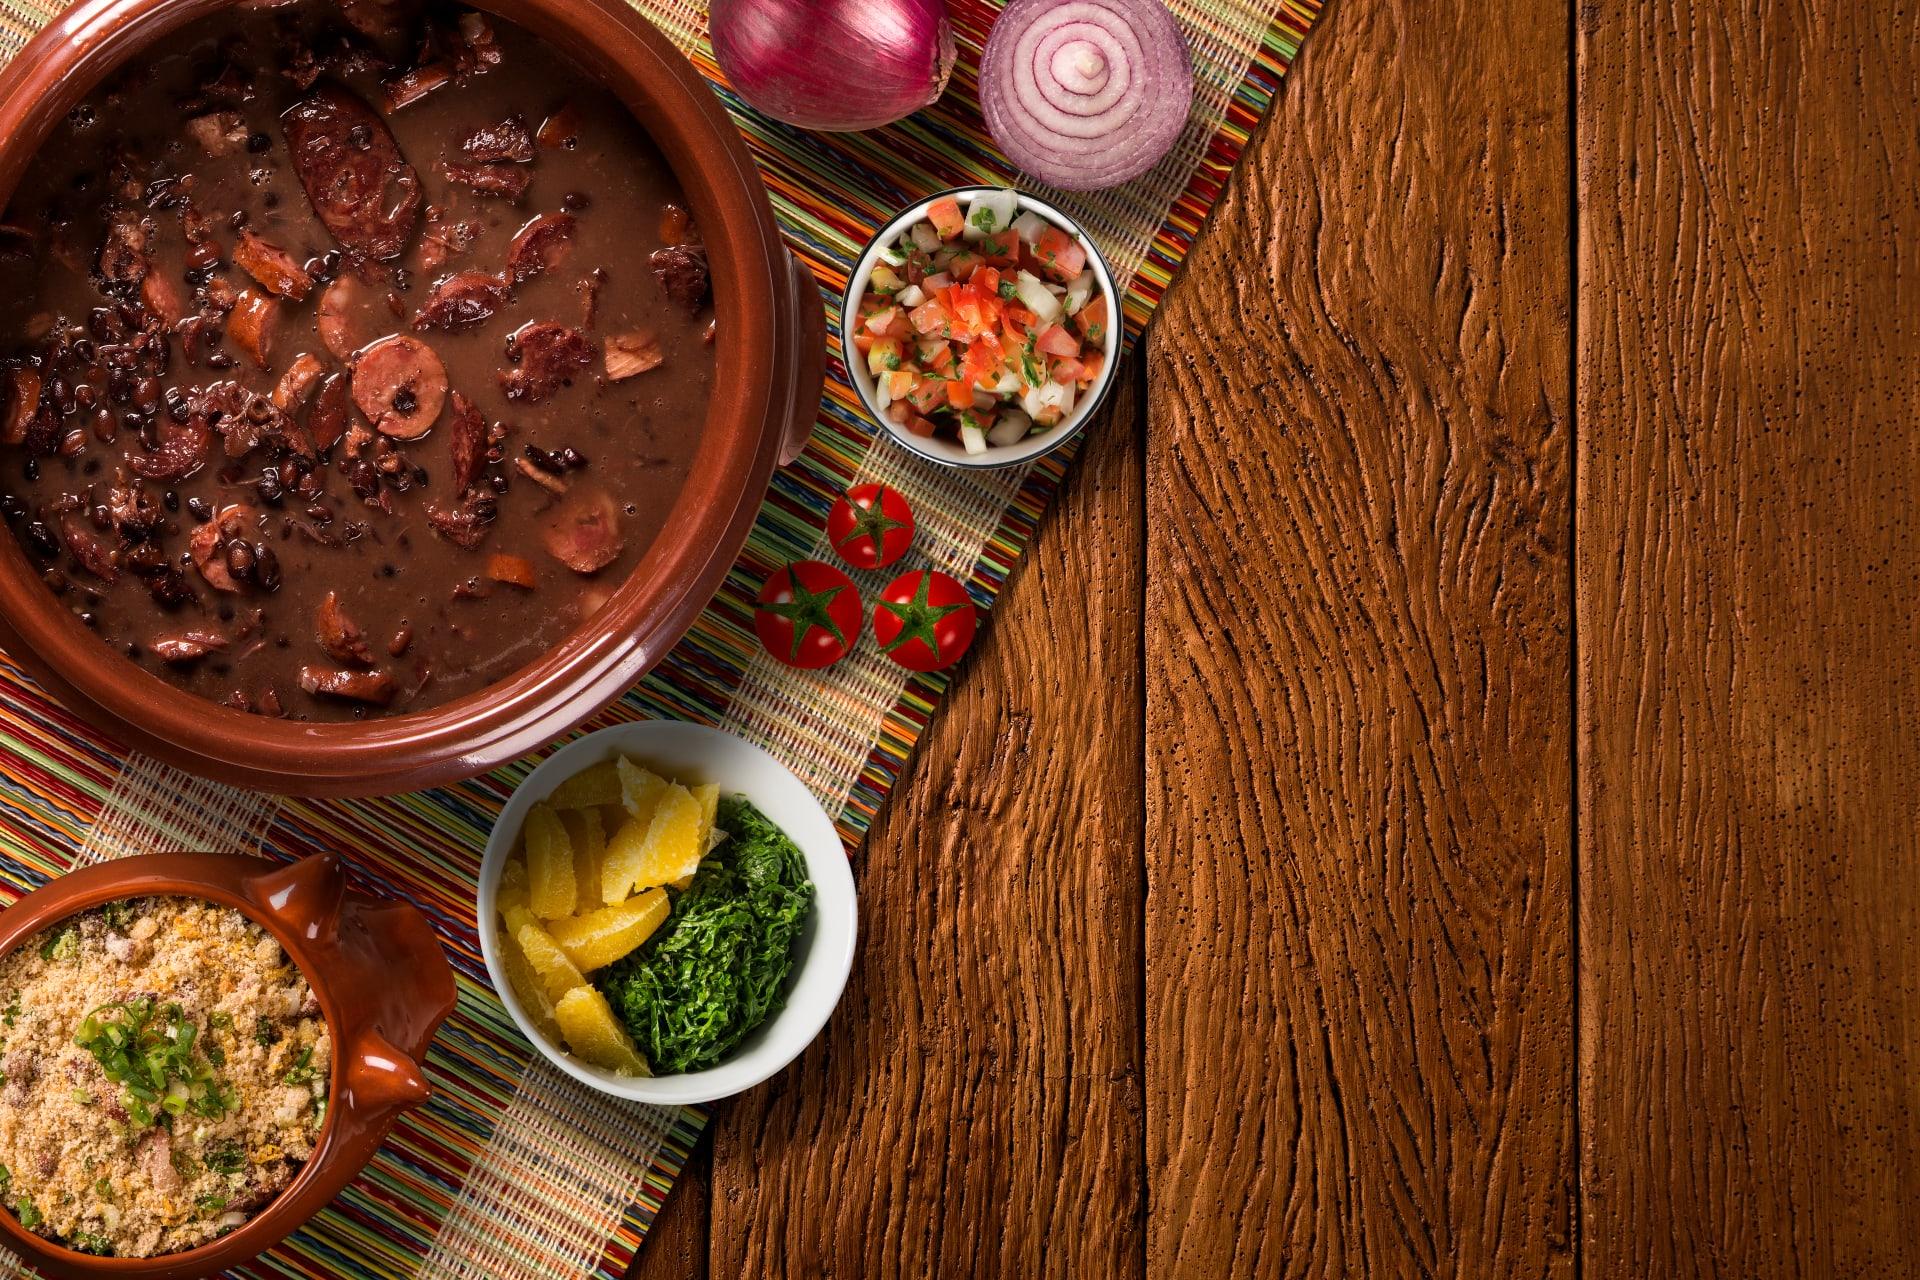 Rio de Janeiro - Feijoada - how to prepare the Brazilian National Dish